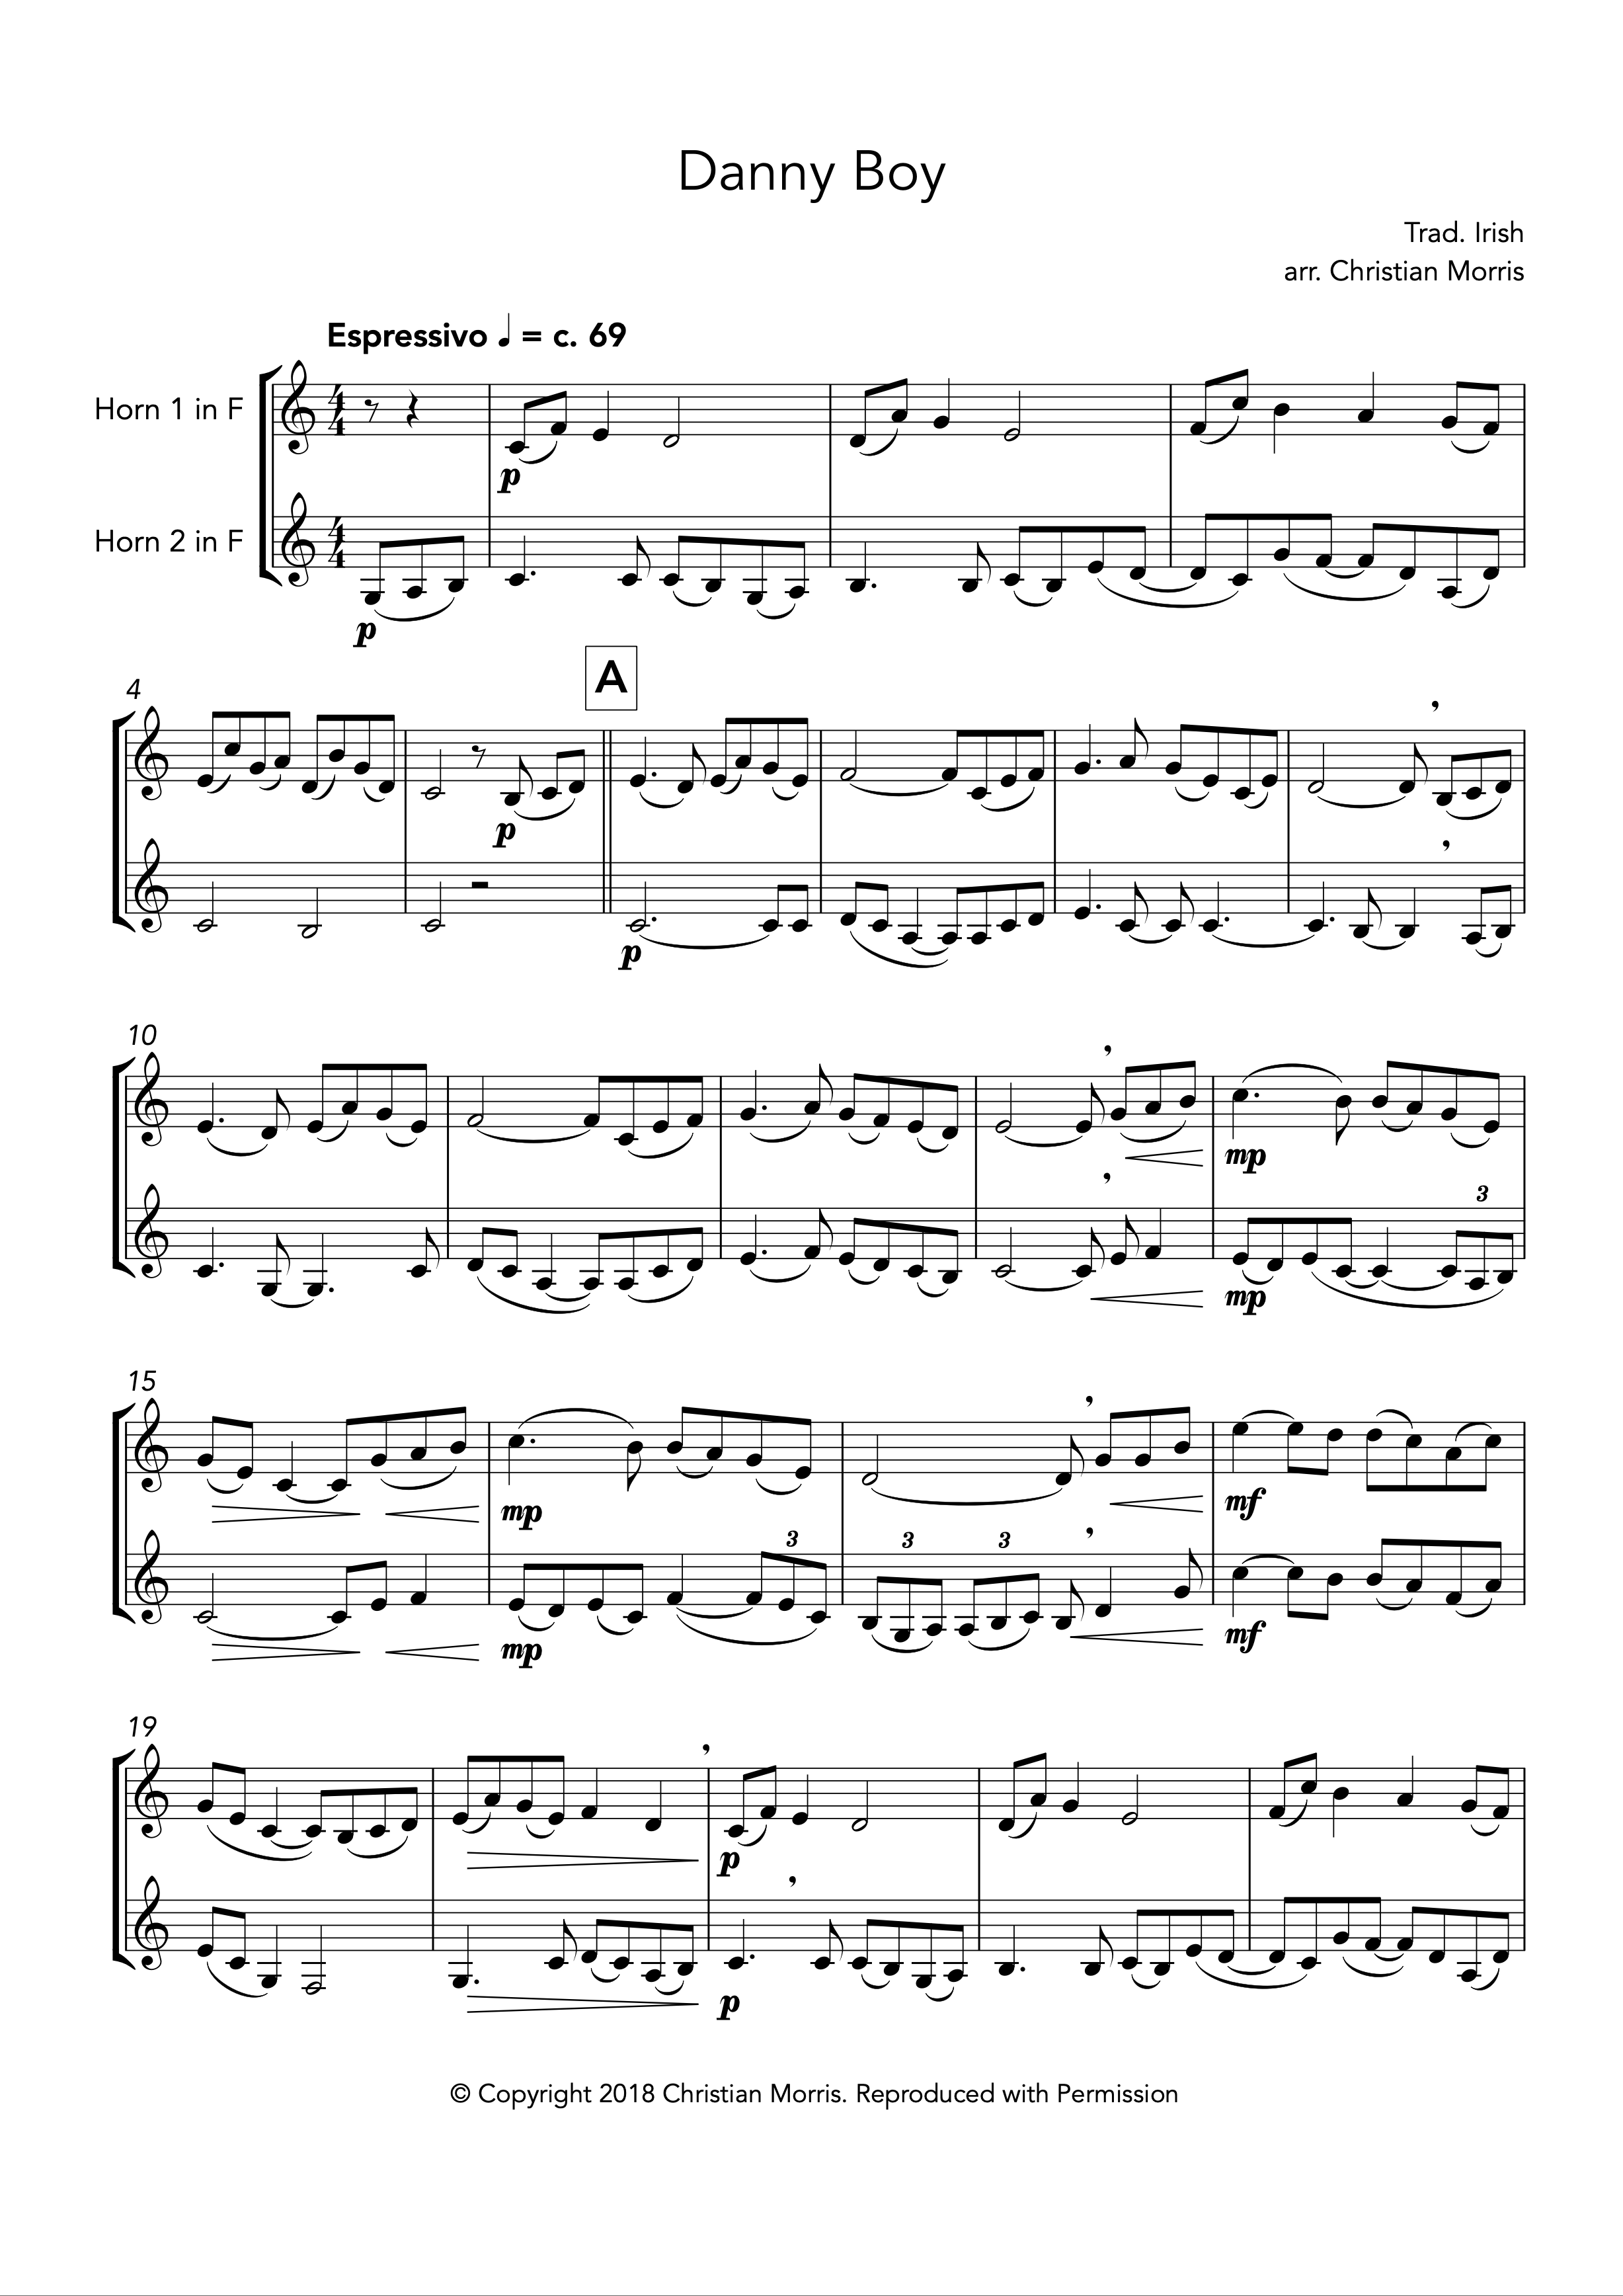 Danny Boy, fantasy for French horn duet